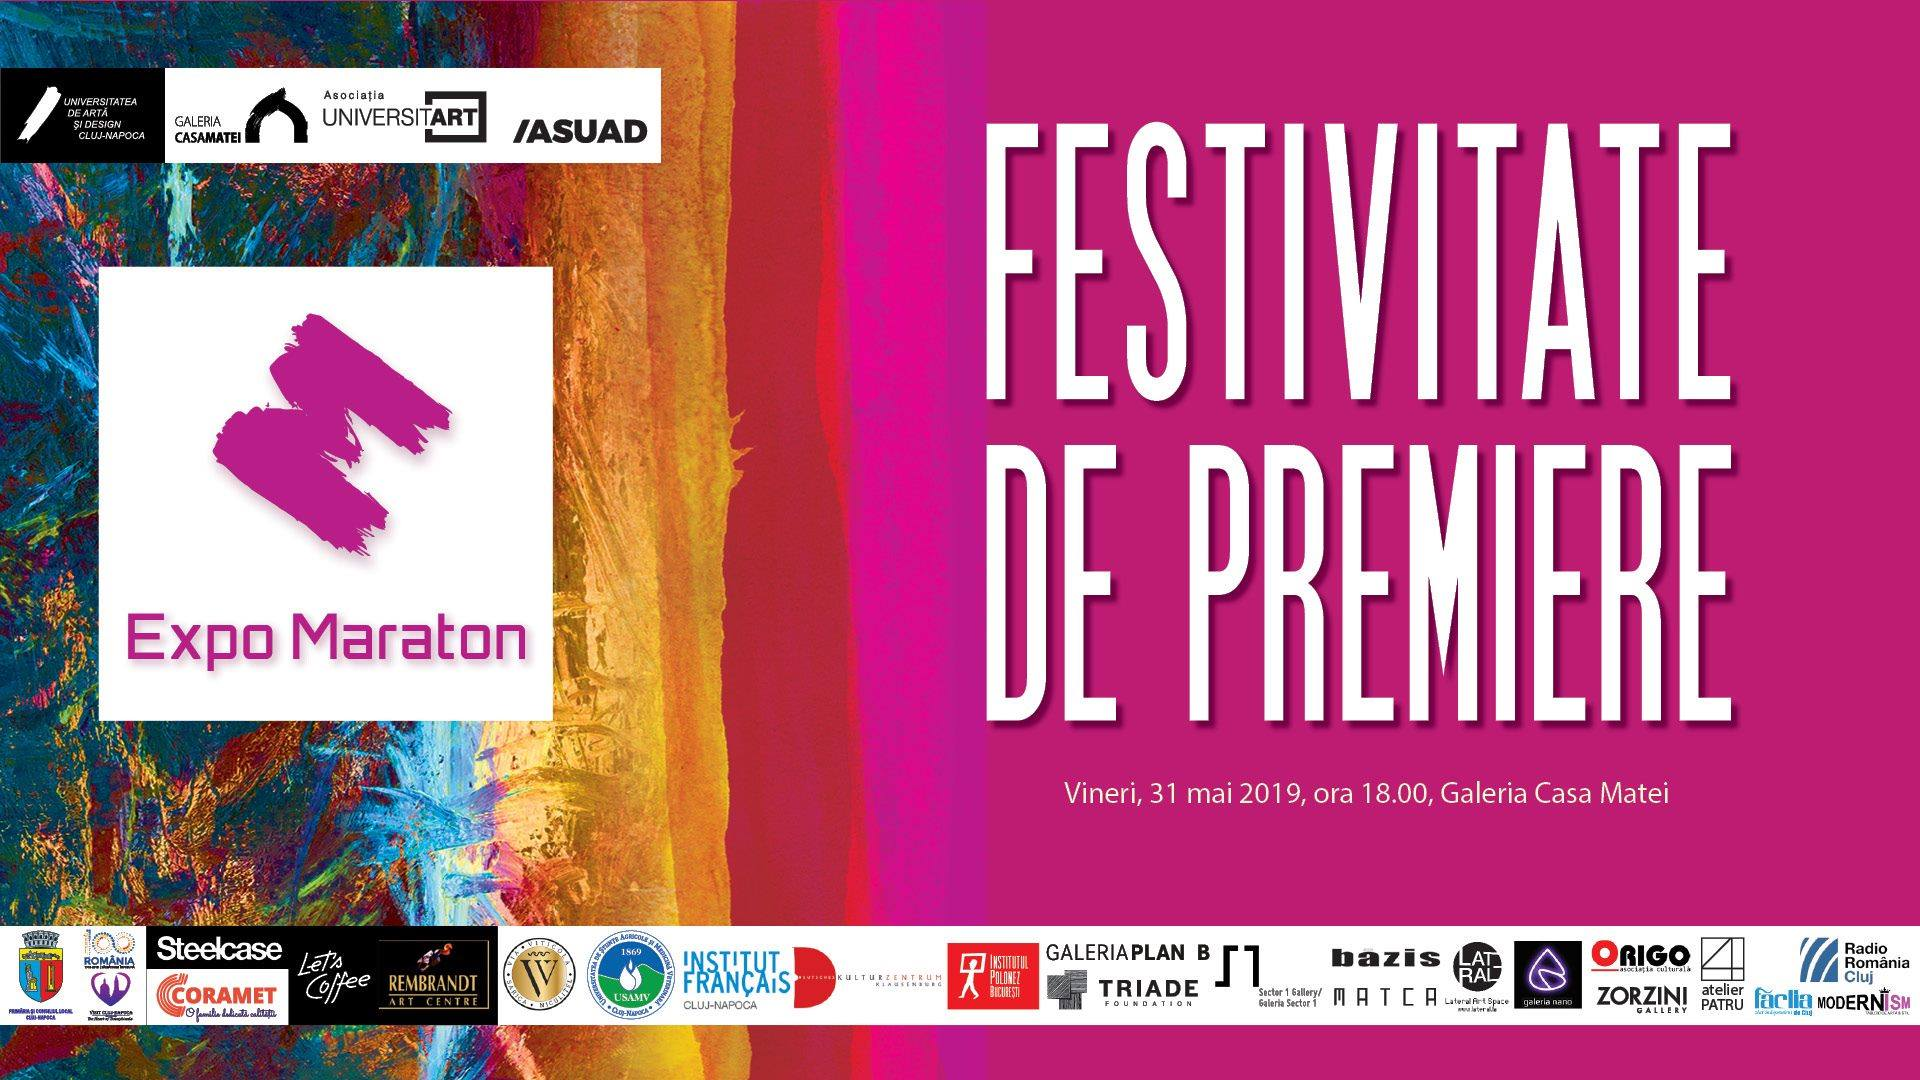 ExpoMaraton #final Festivitatea de premiere 2019